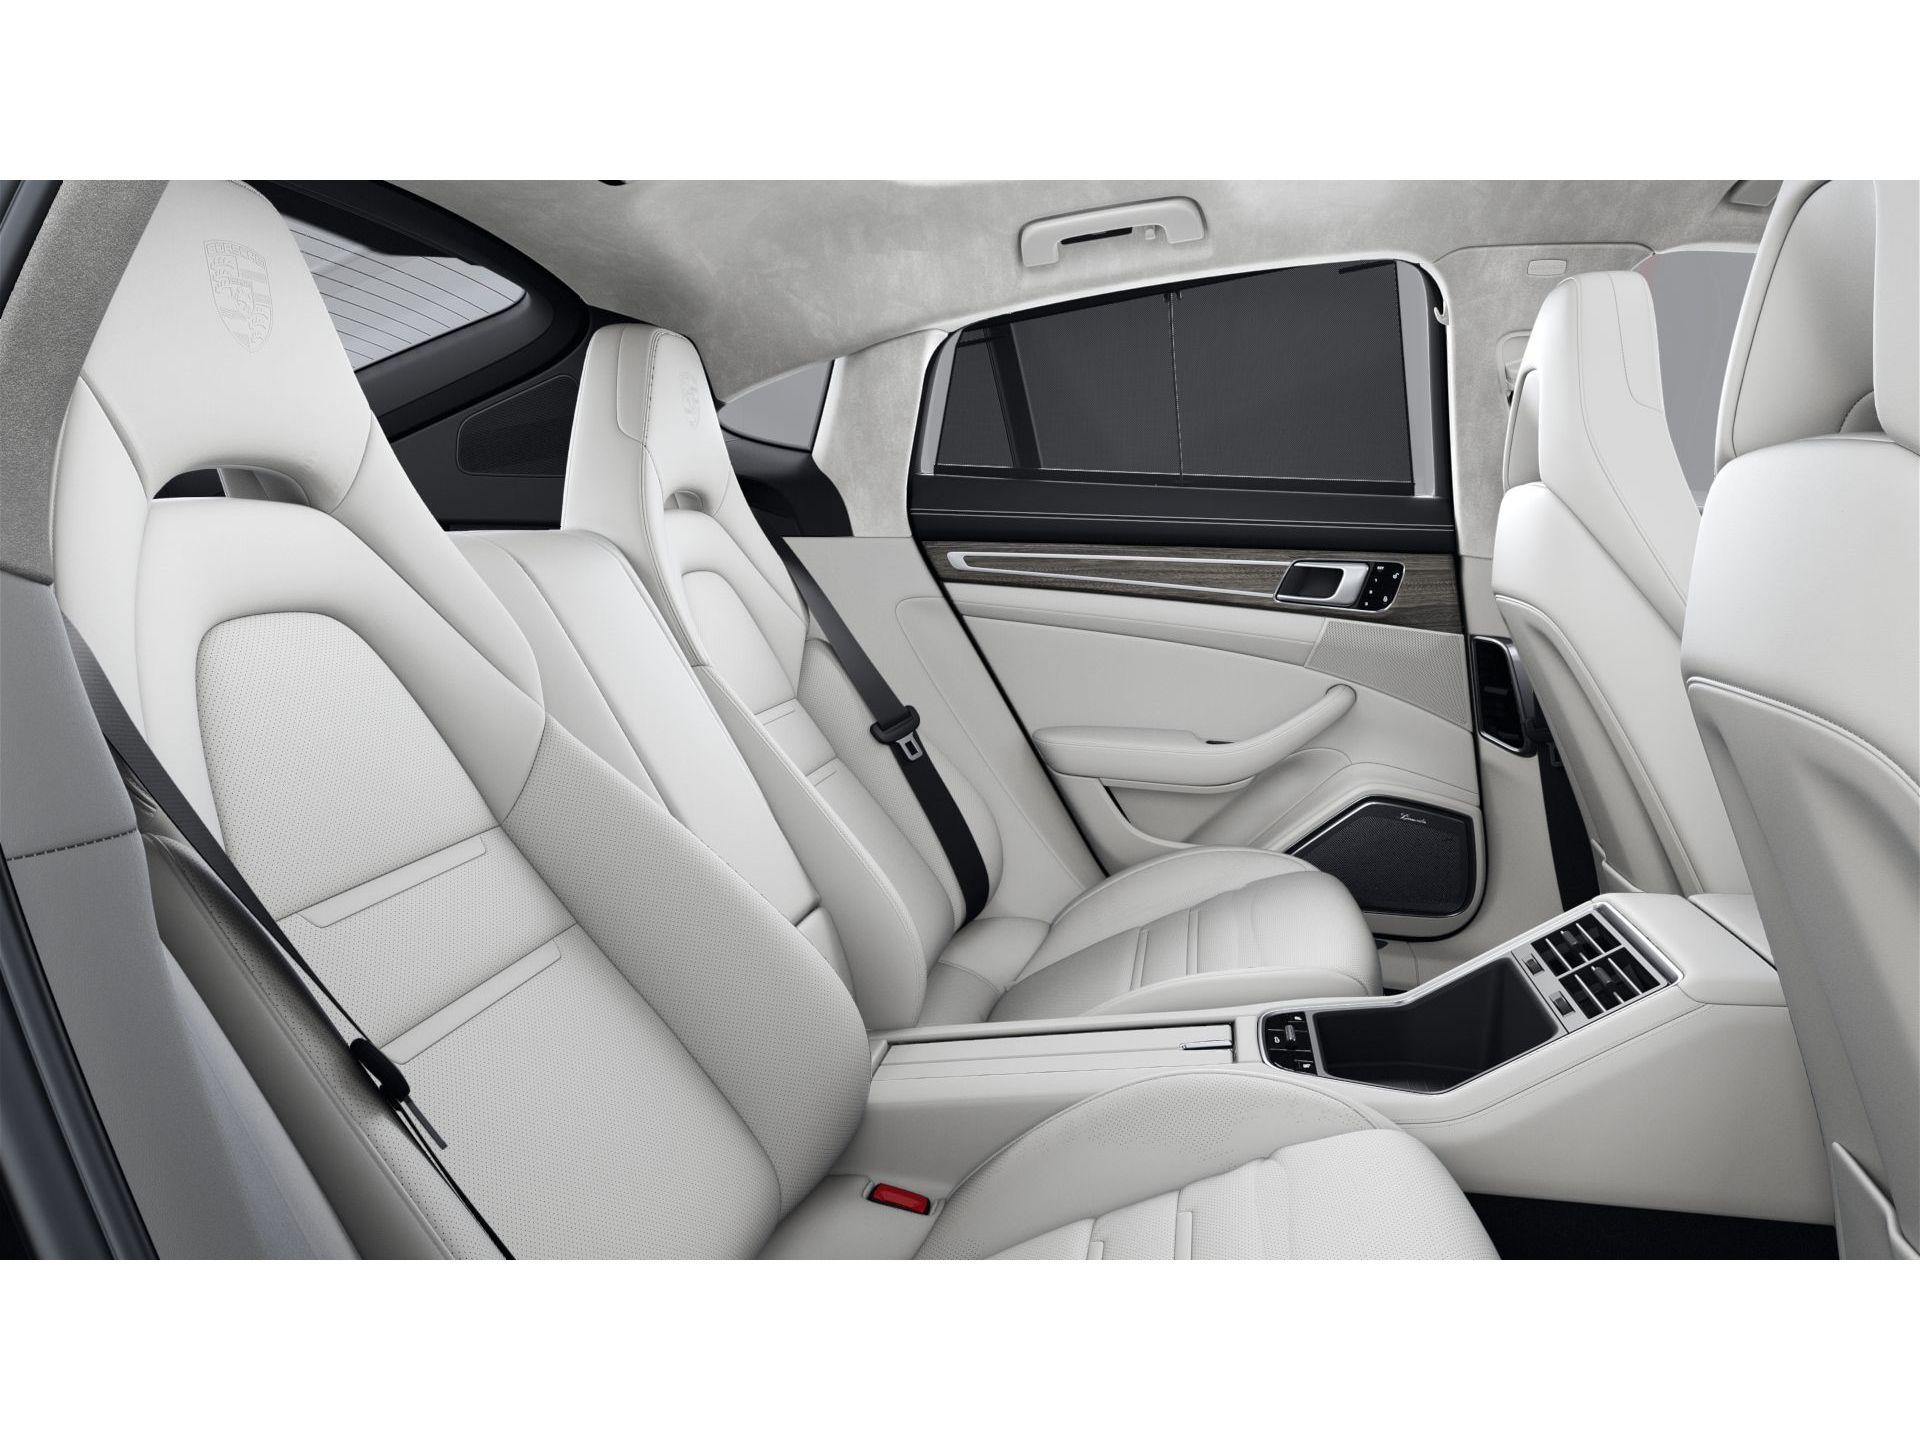 2022 Porsche Panamera Turbo S – 4